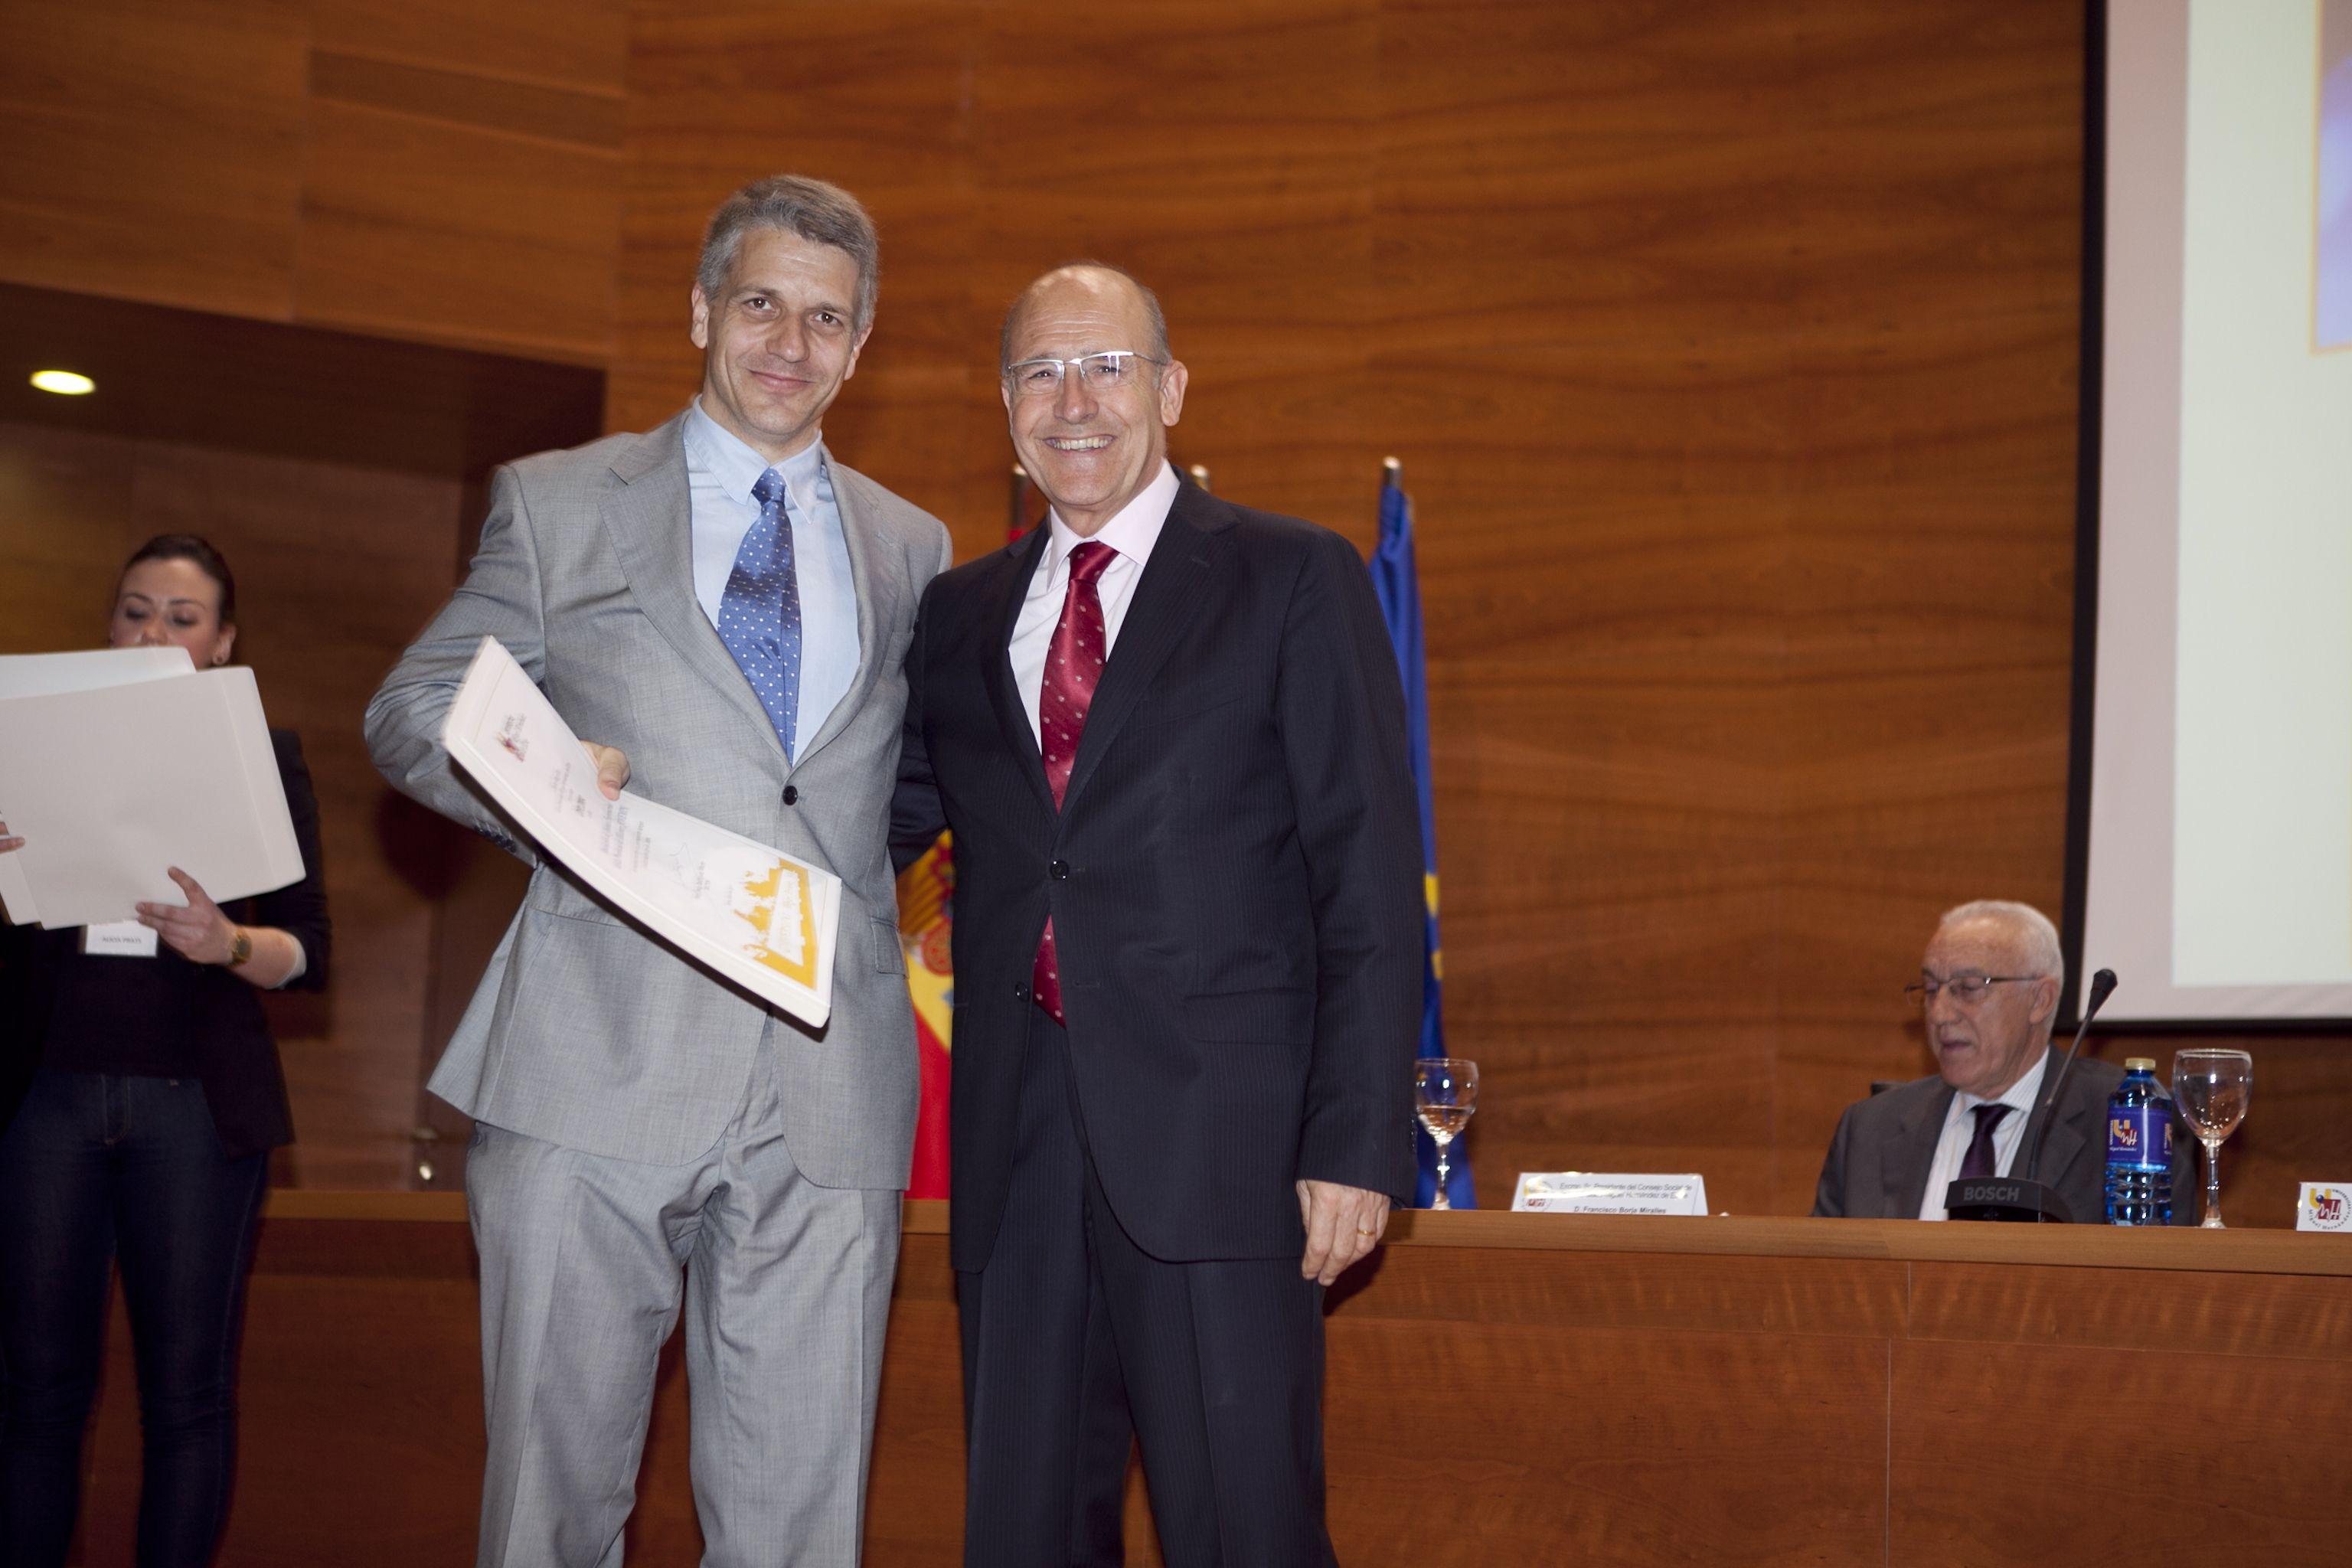 umh-diplomas-rector_mg_6556.jpg